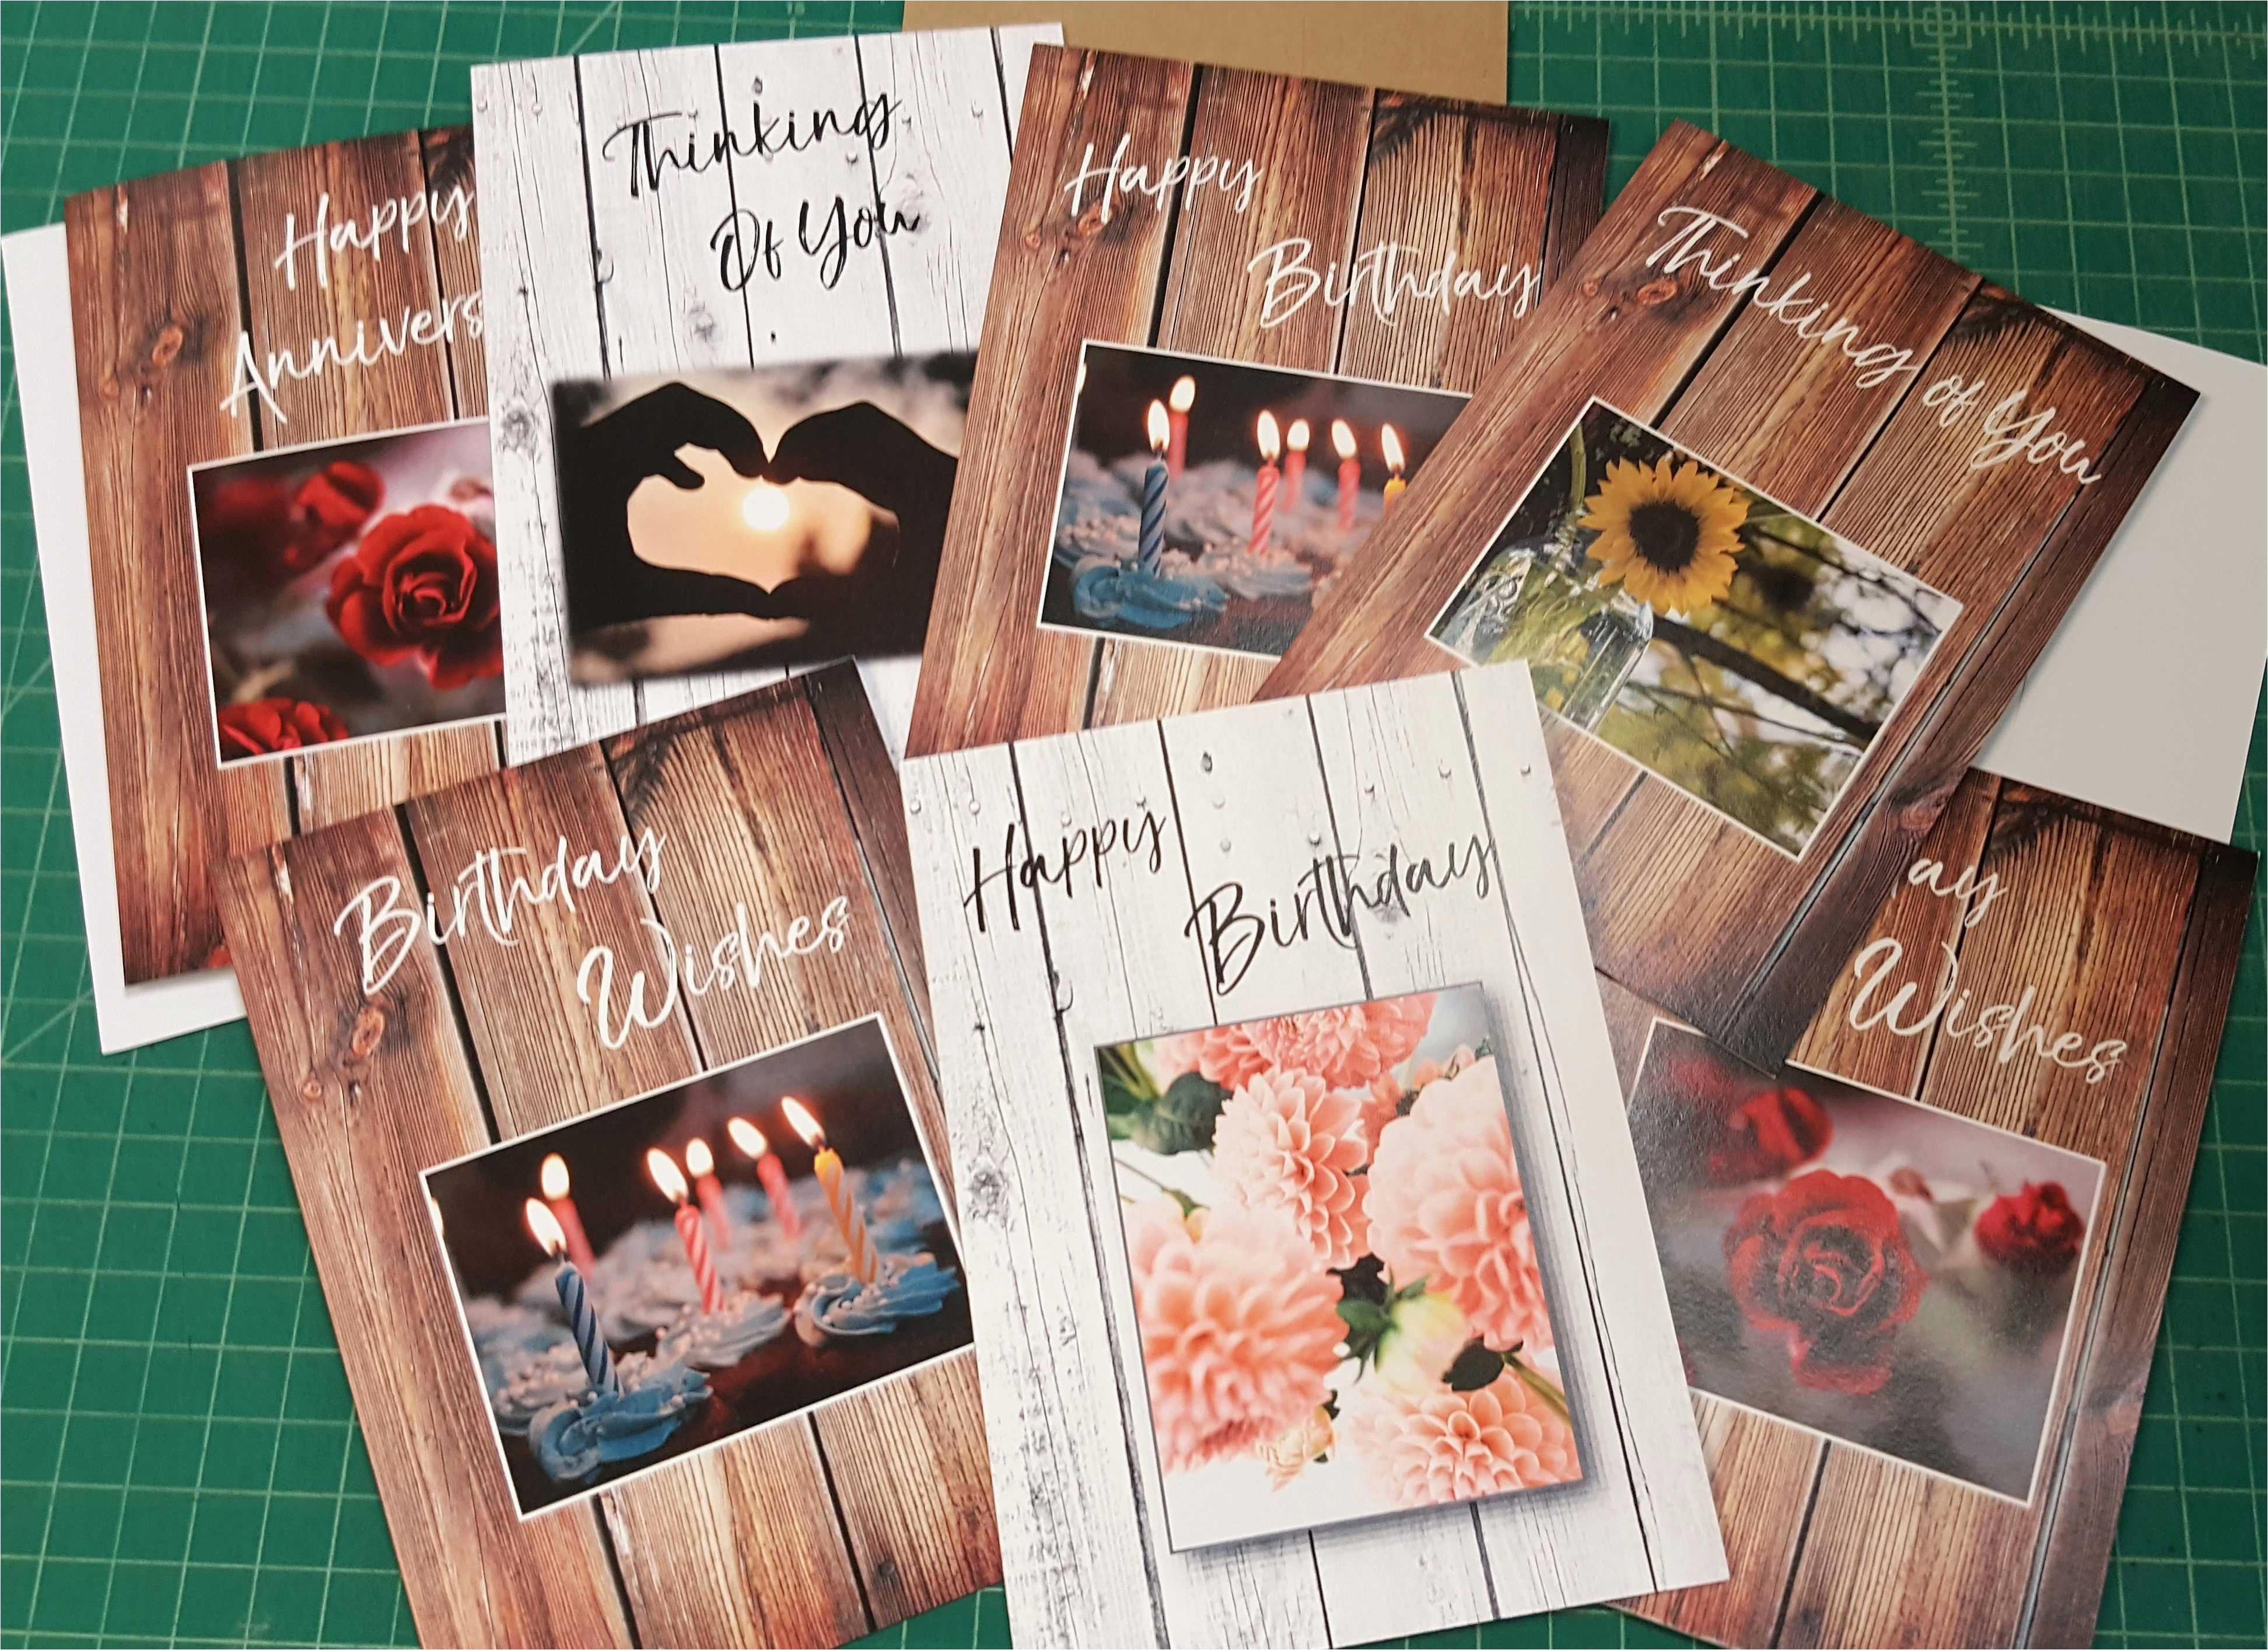 Places to Buy Birthday Cards Near Me Birthday Cards Near Me New Birthday Cards New Birthday